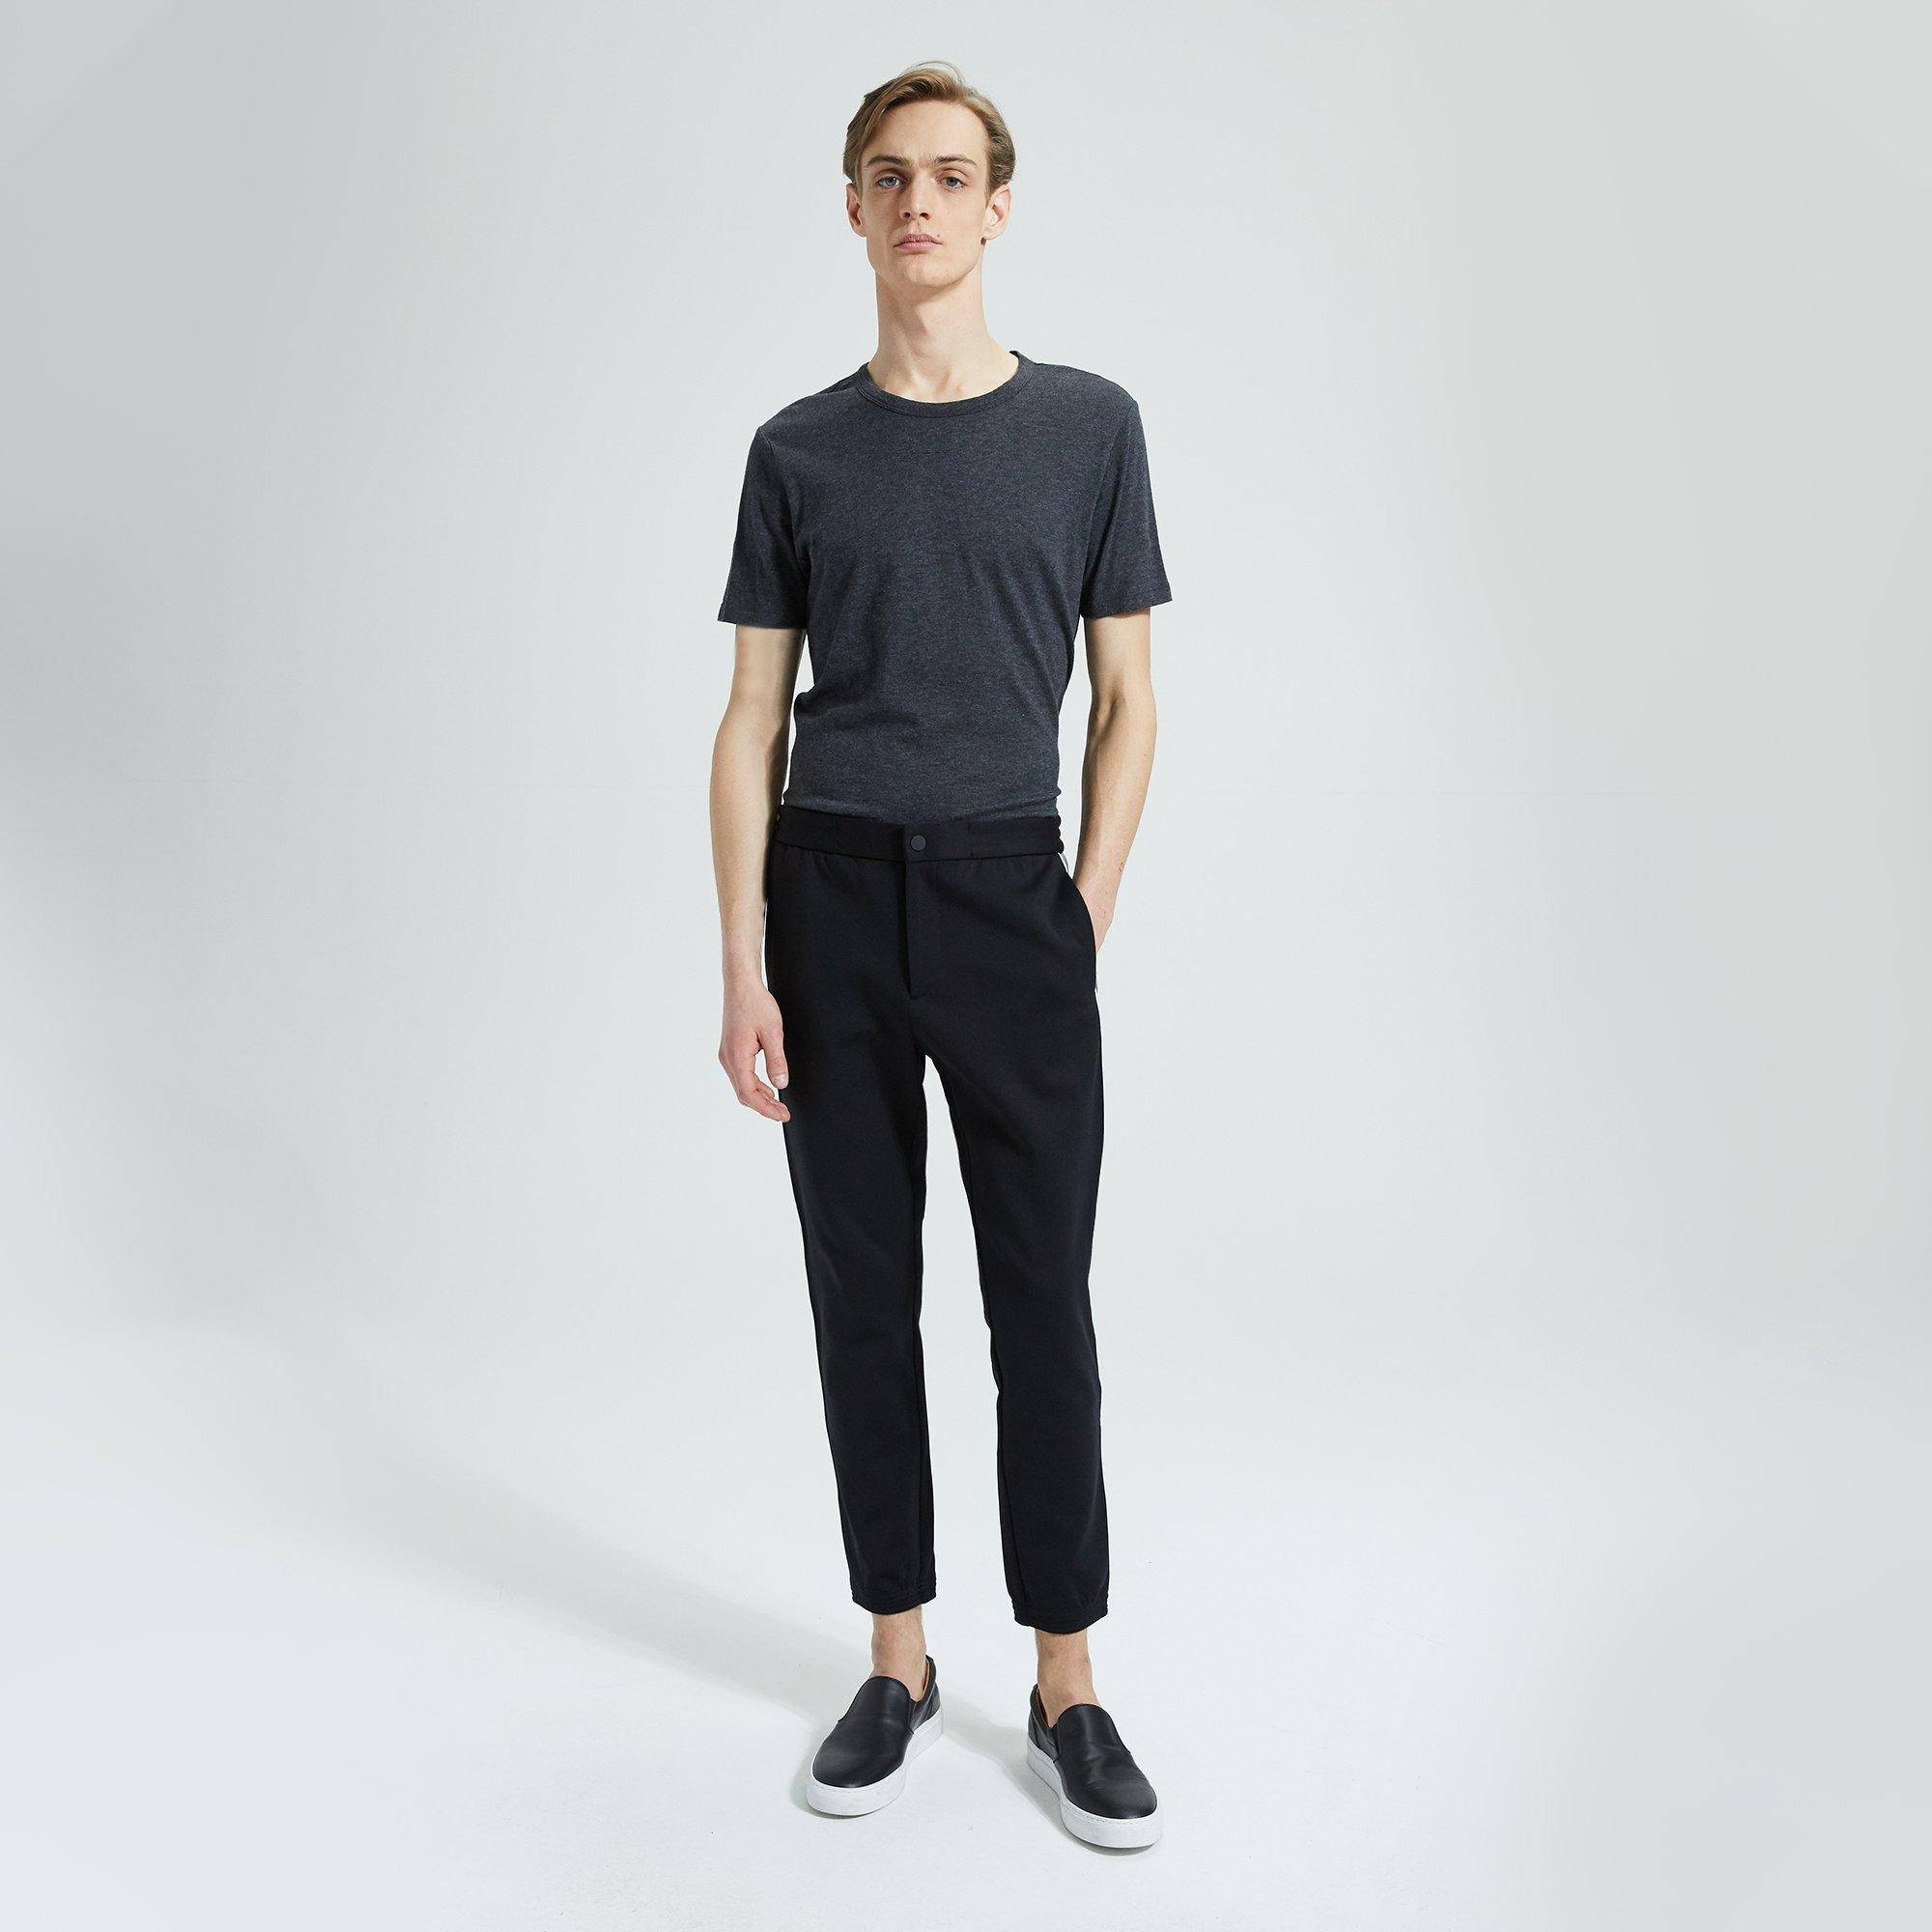 Theory Tech Face Ponte Terrance Pant  - BLACK - male - Size: Medium